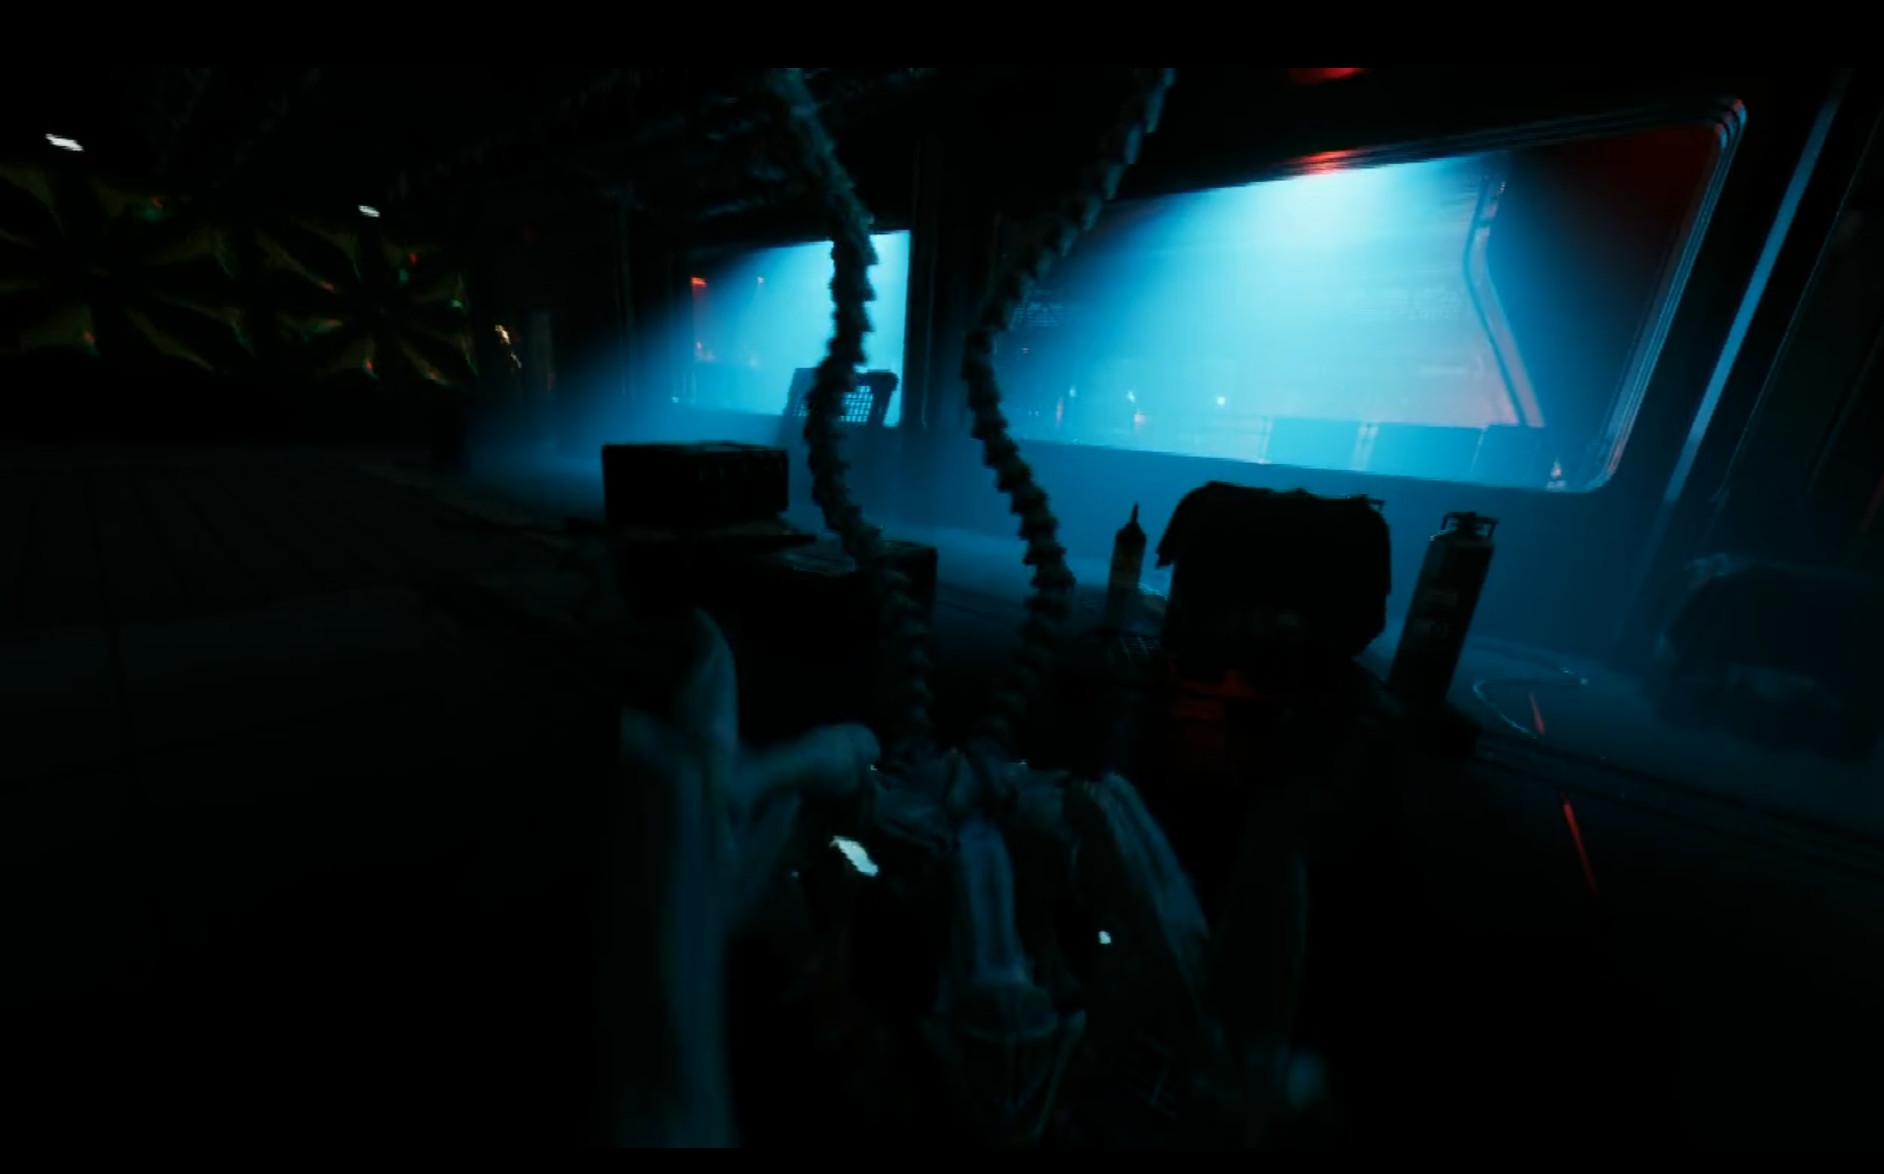 Awaken Realms анонсировала видеоигру Nemesis: Distress —адаптацию настолки «Немезида»